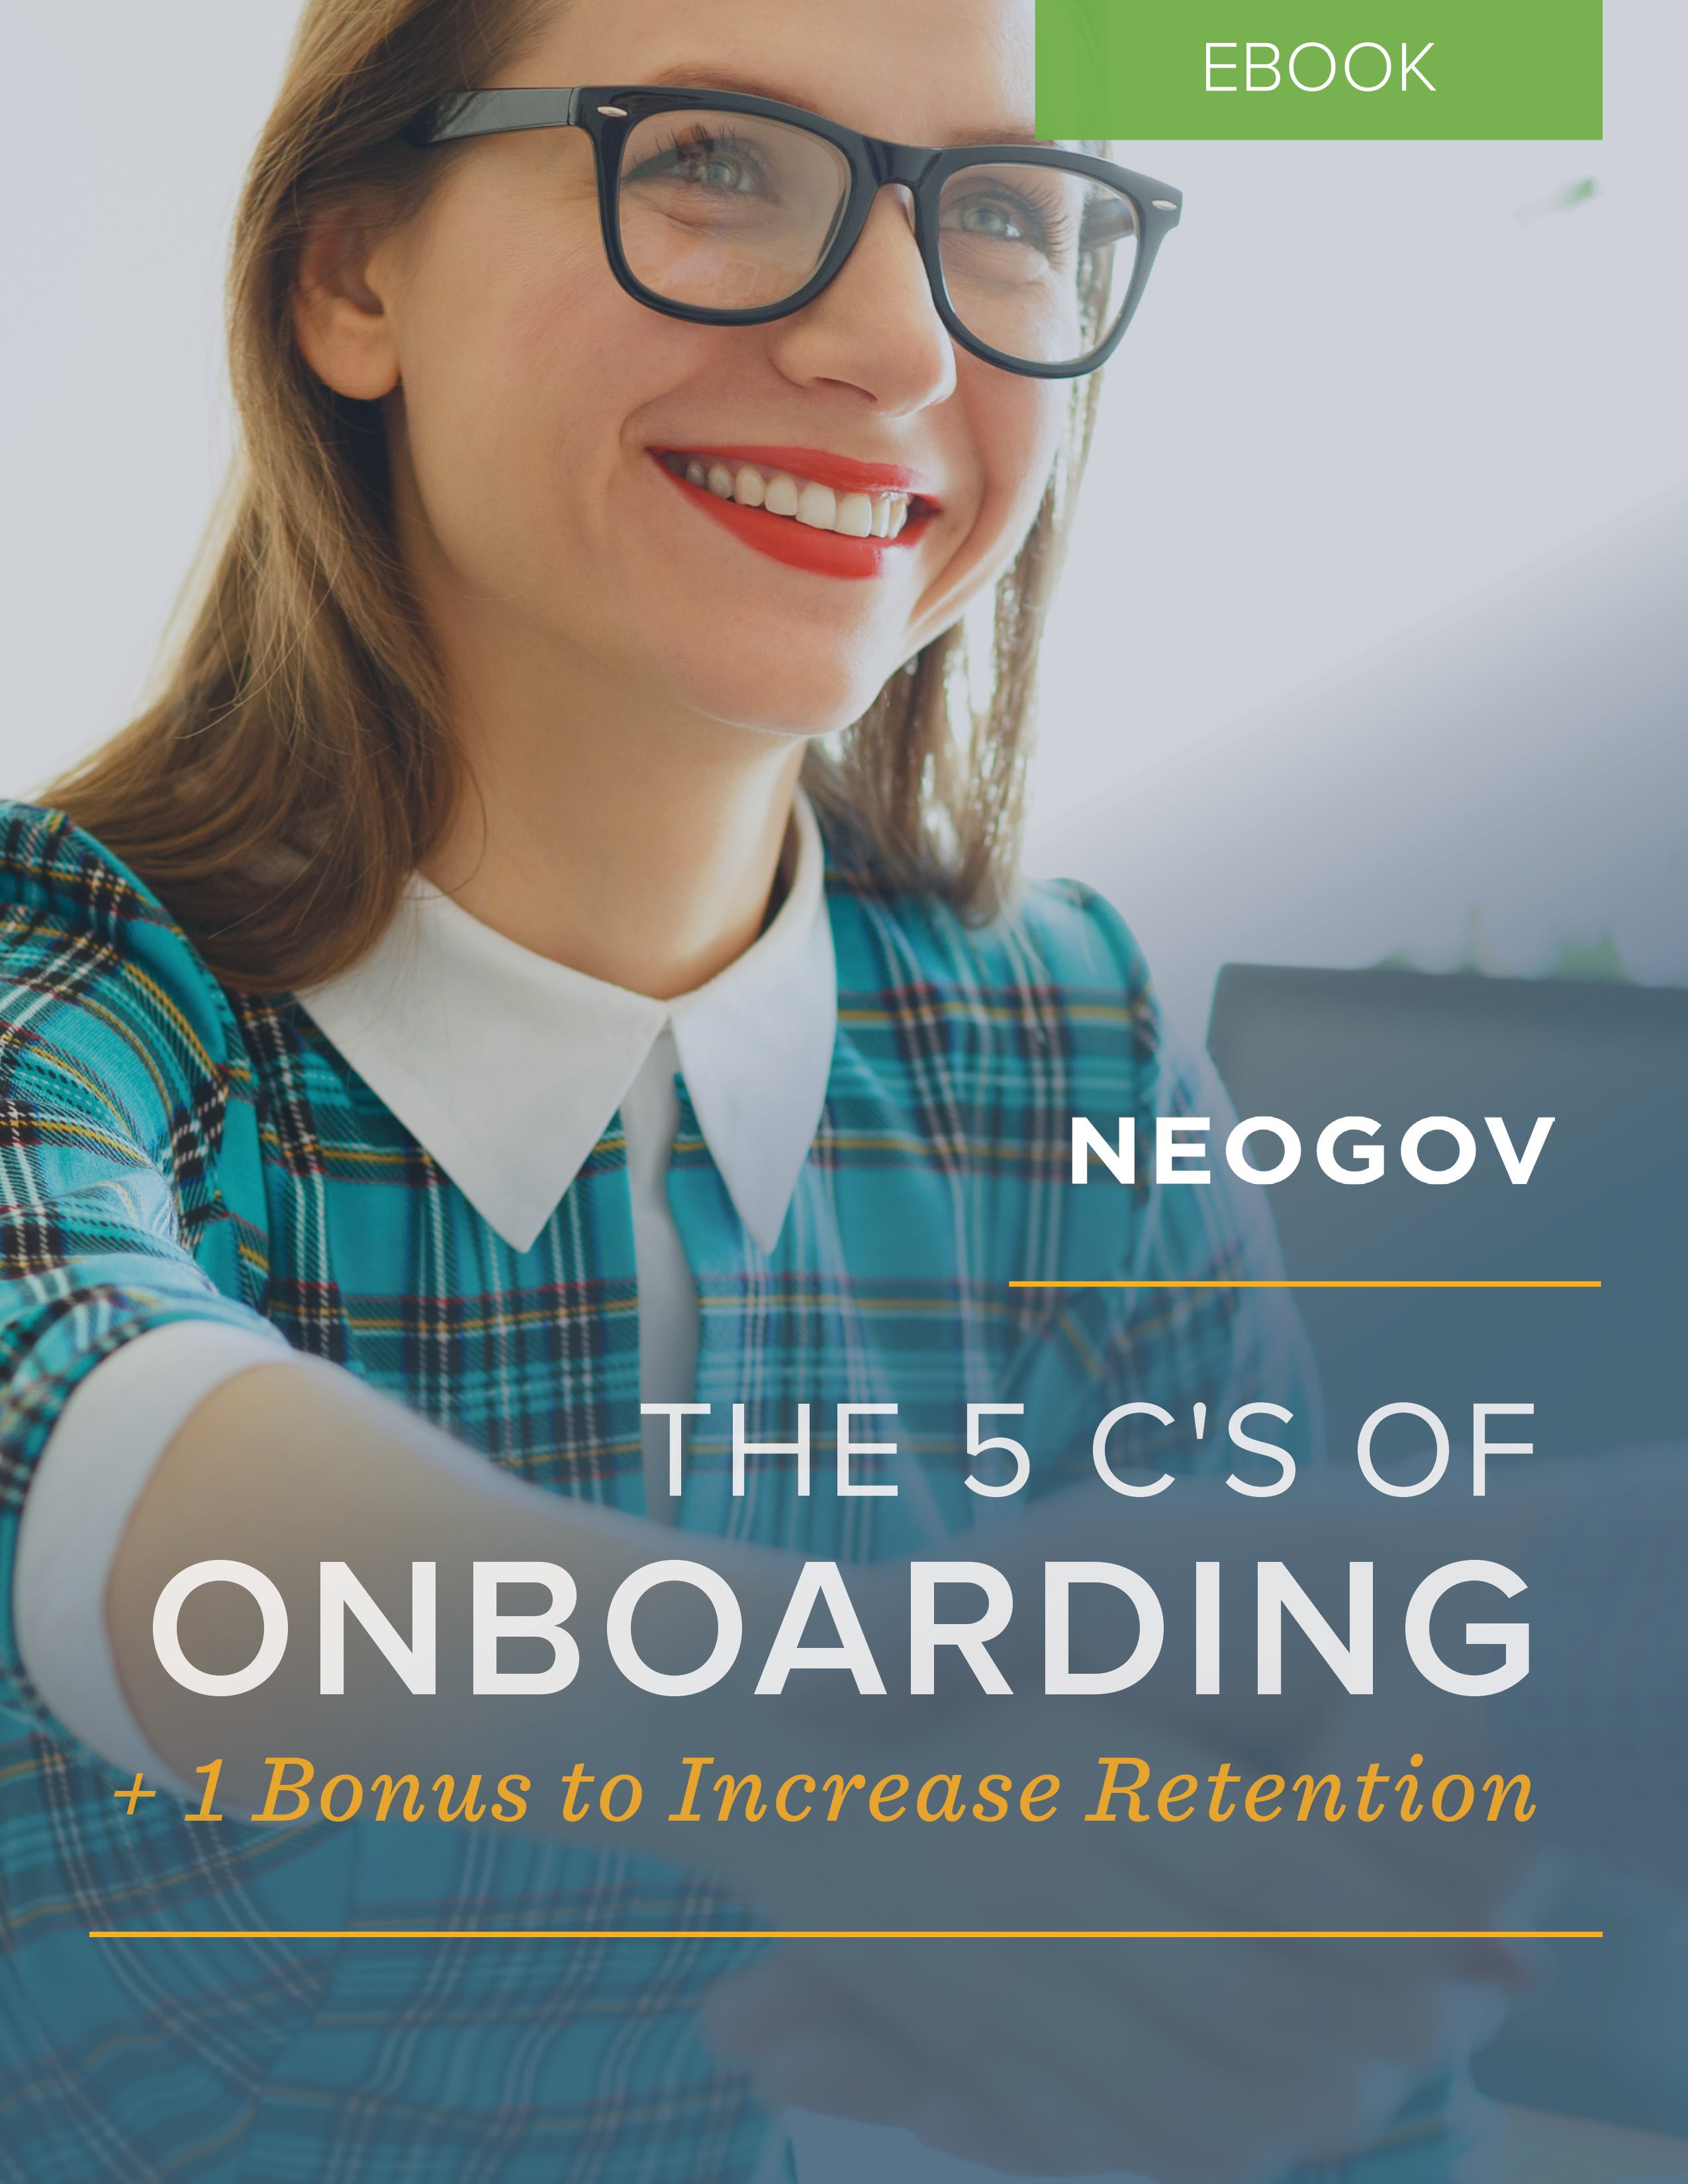 NEOGOV 6 C's of Onboarding